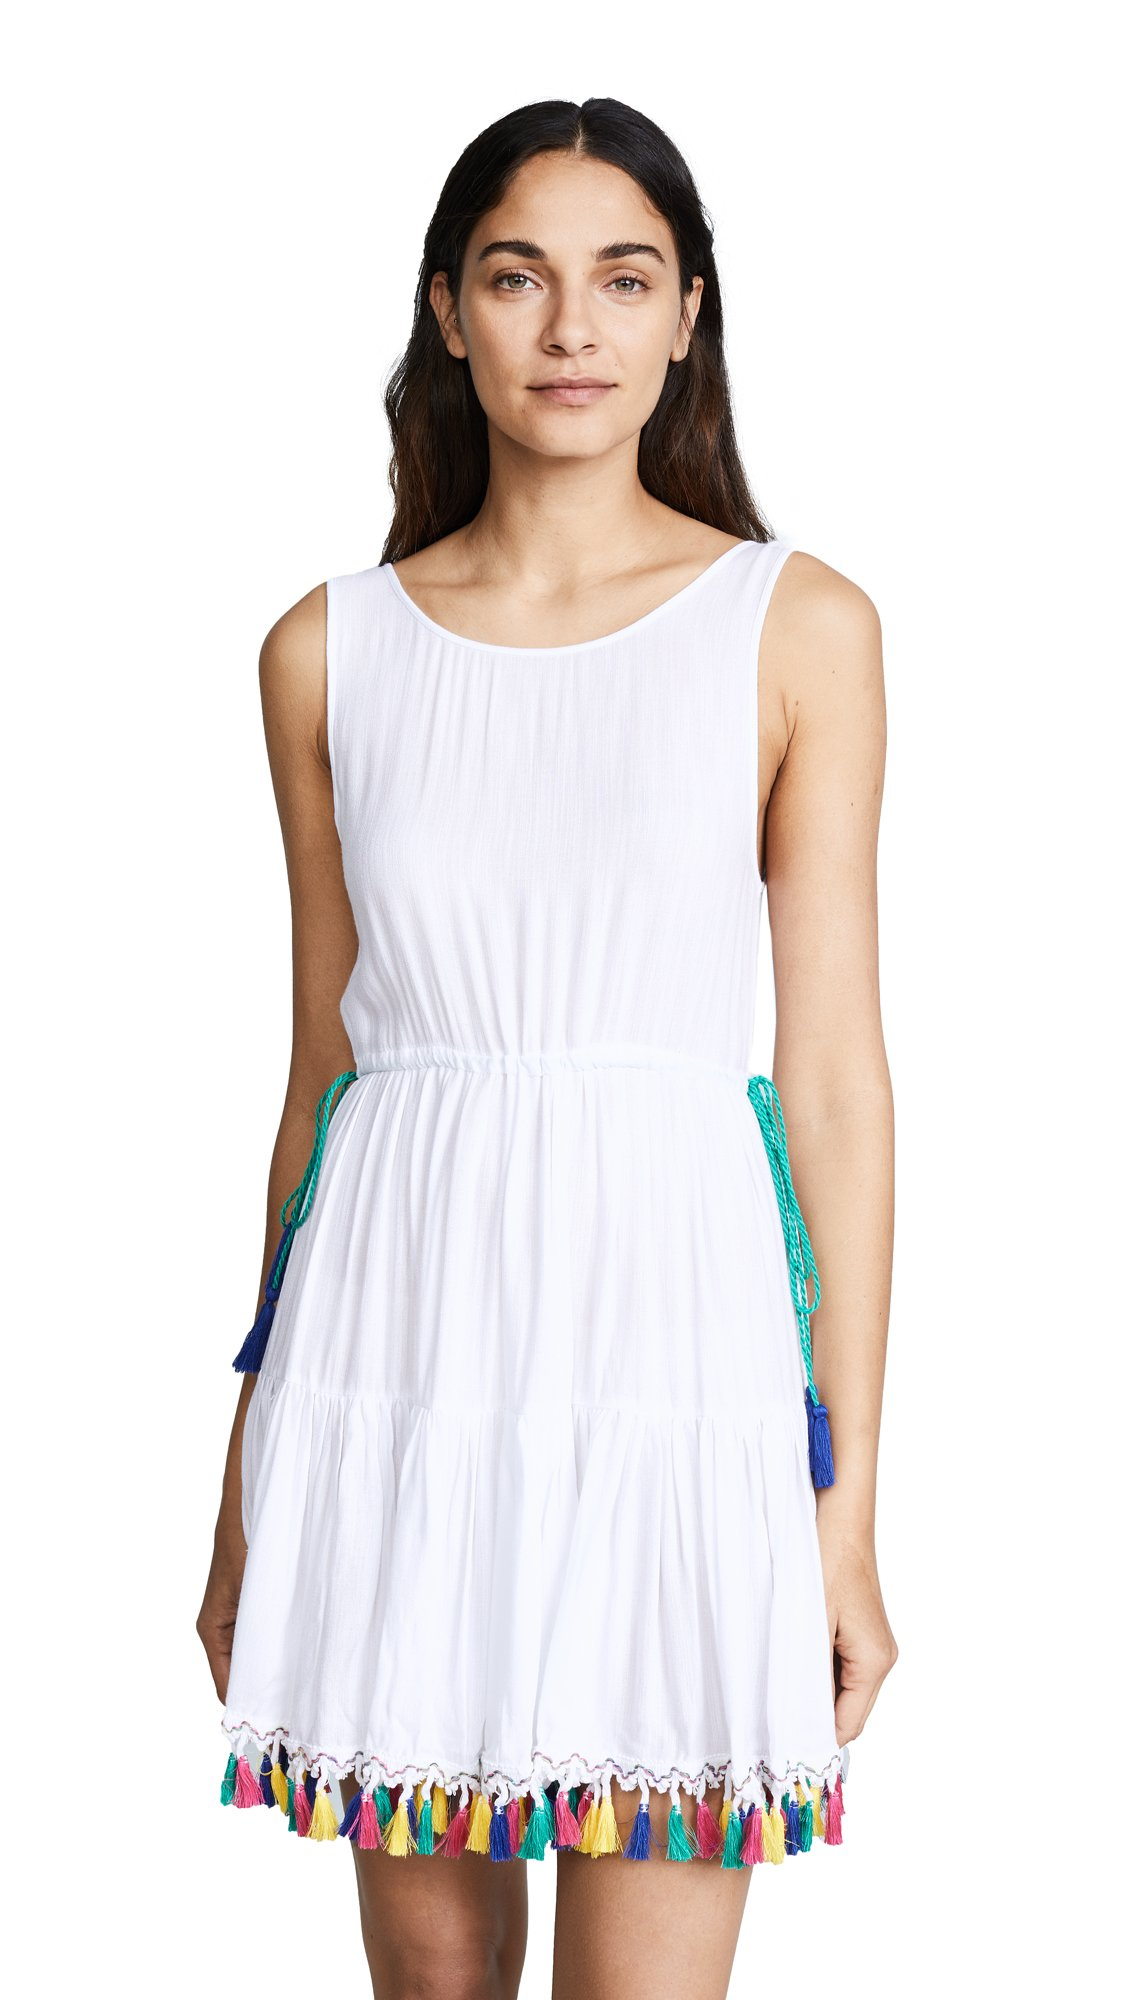 Nanette Lepore Women's Fiesta Covers Short Dress Coverup, White, Small